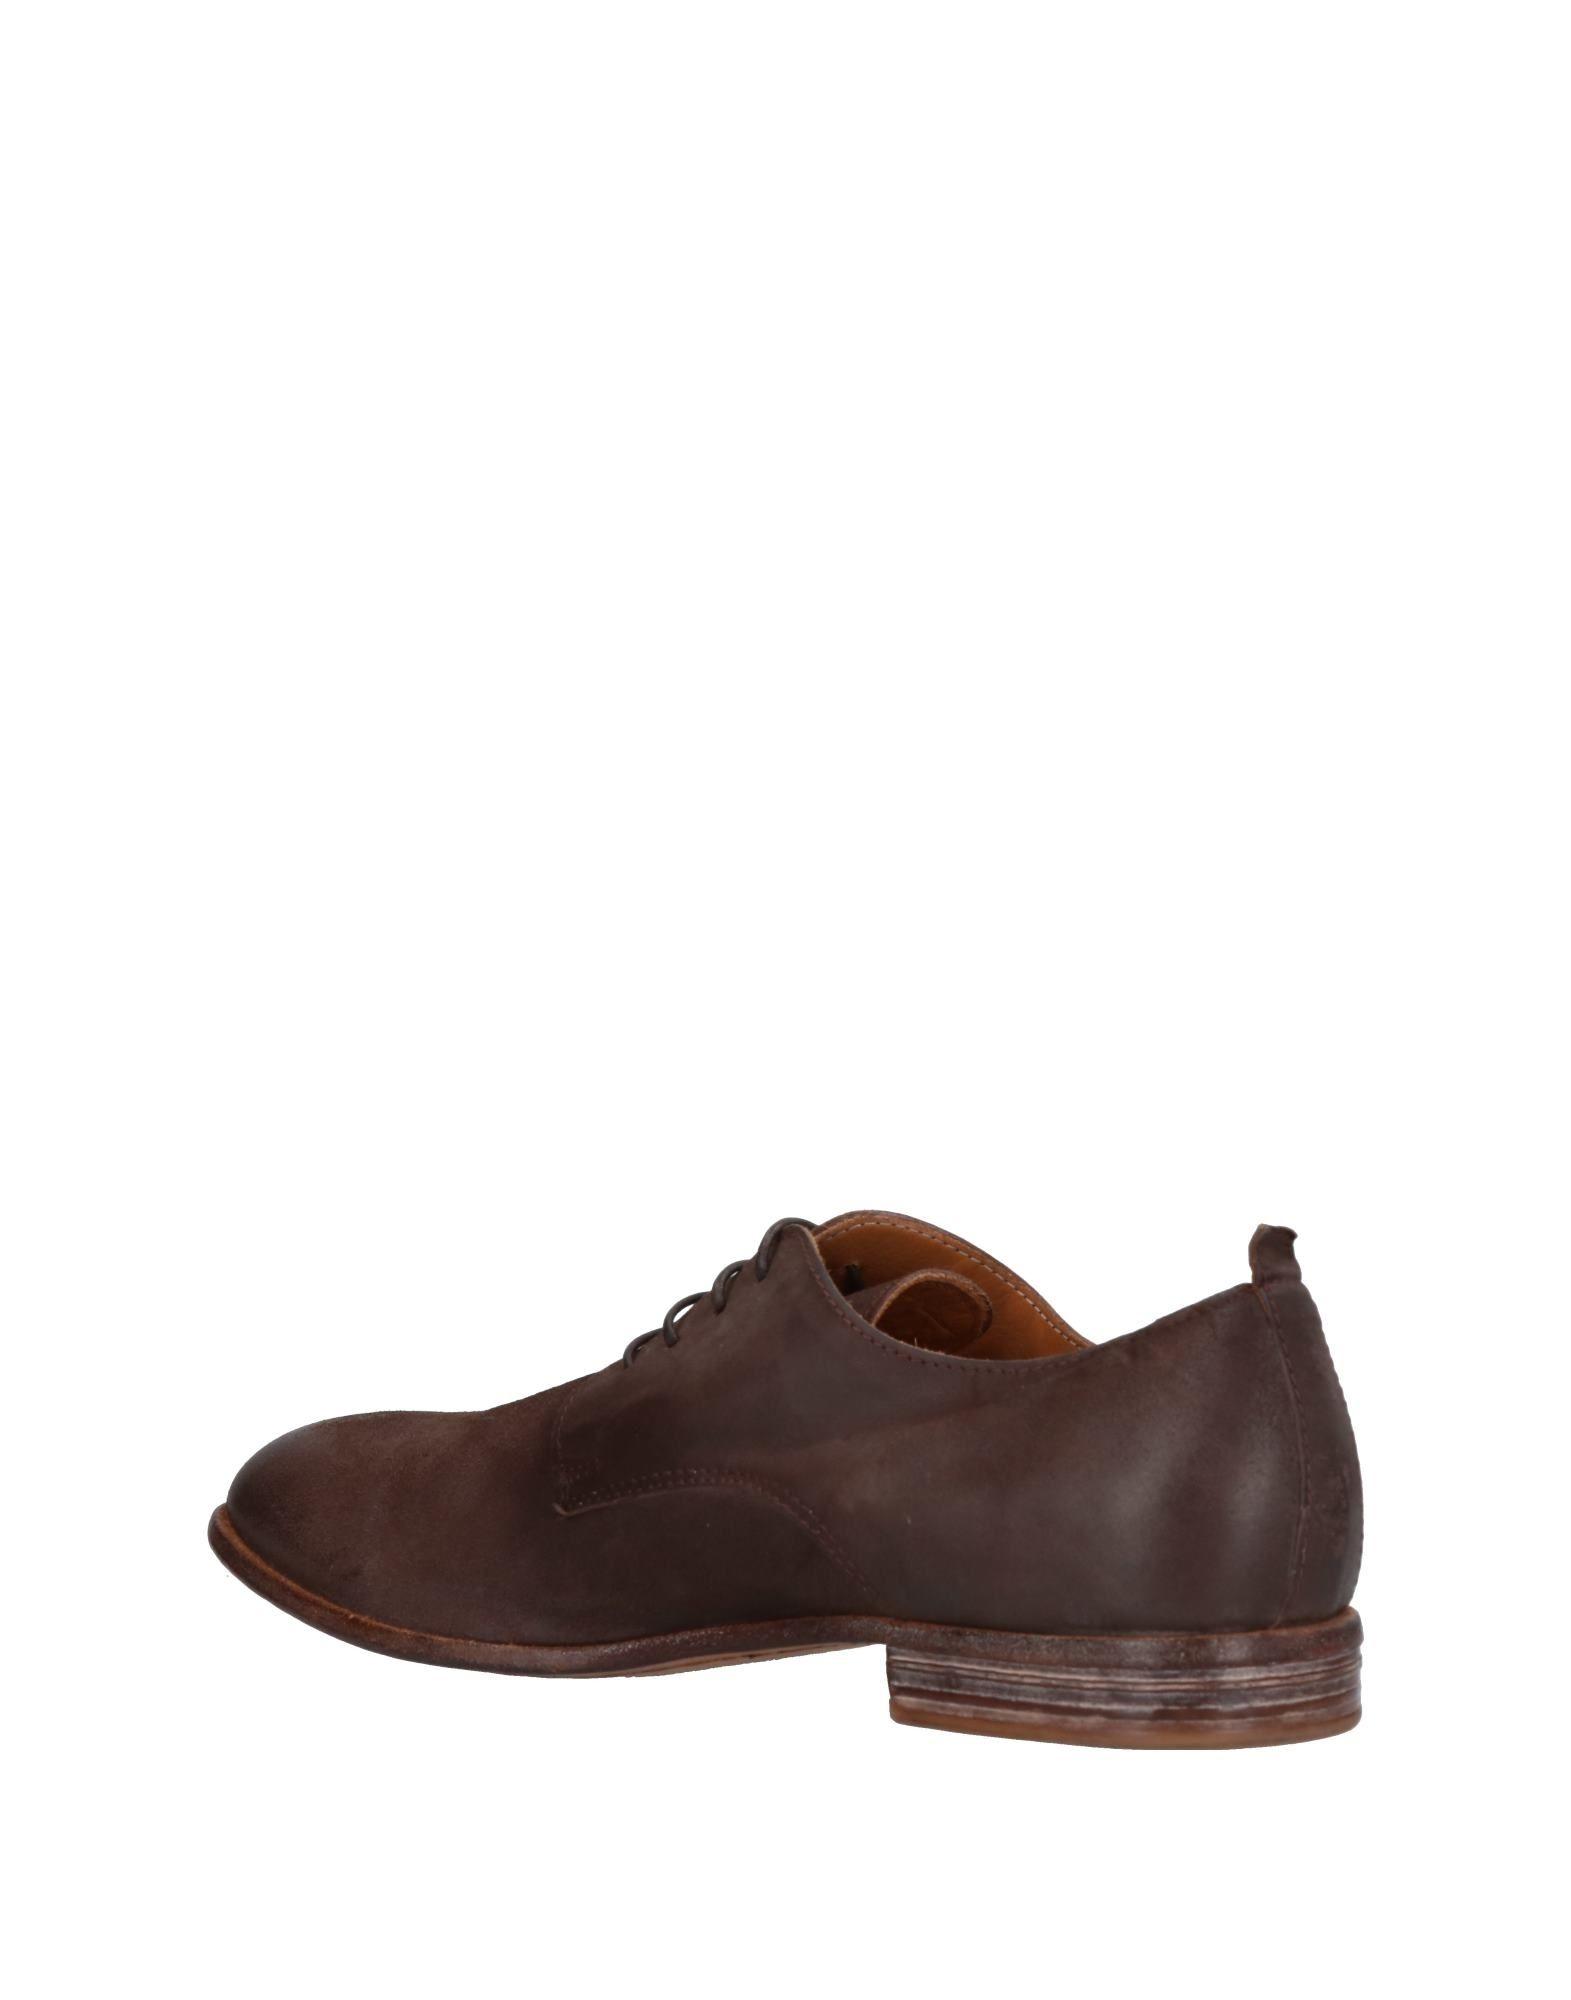 CHAUSSURES - Chaussures à lacetsMoma DNJL5RV